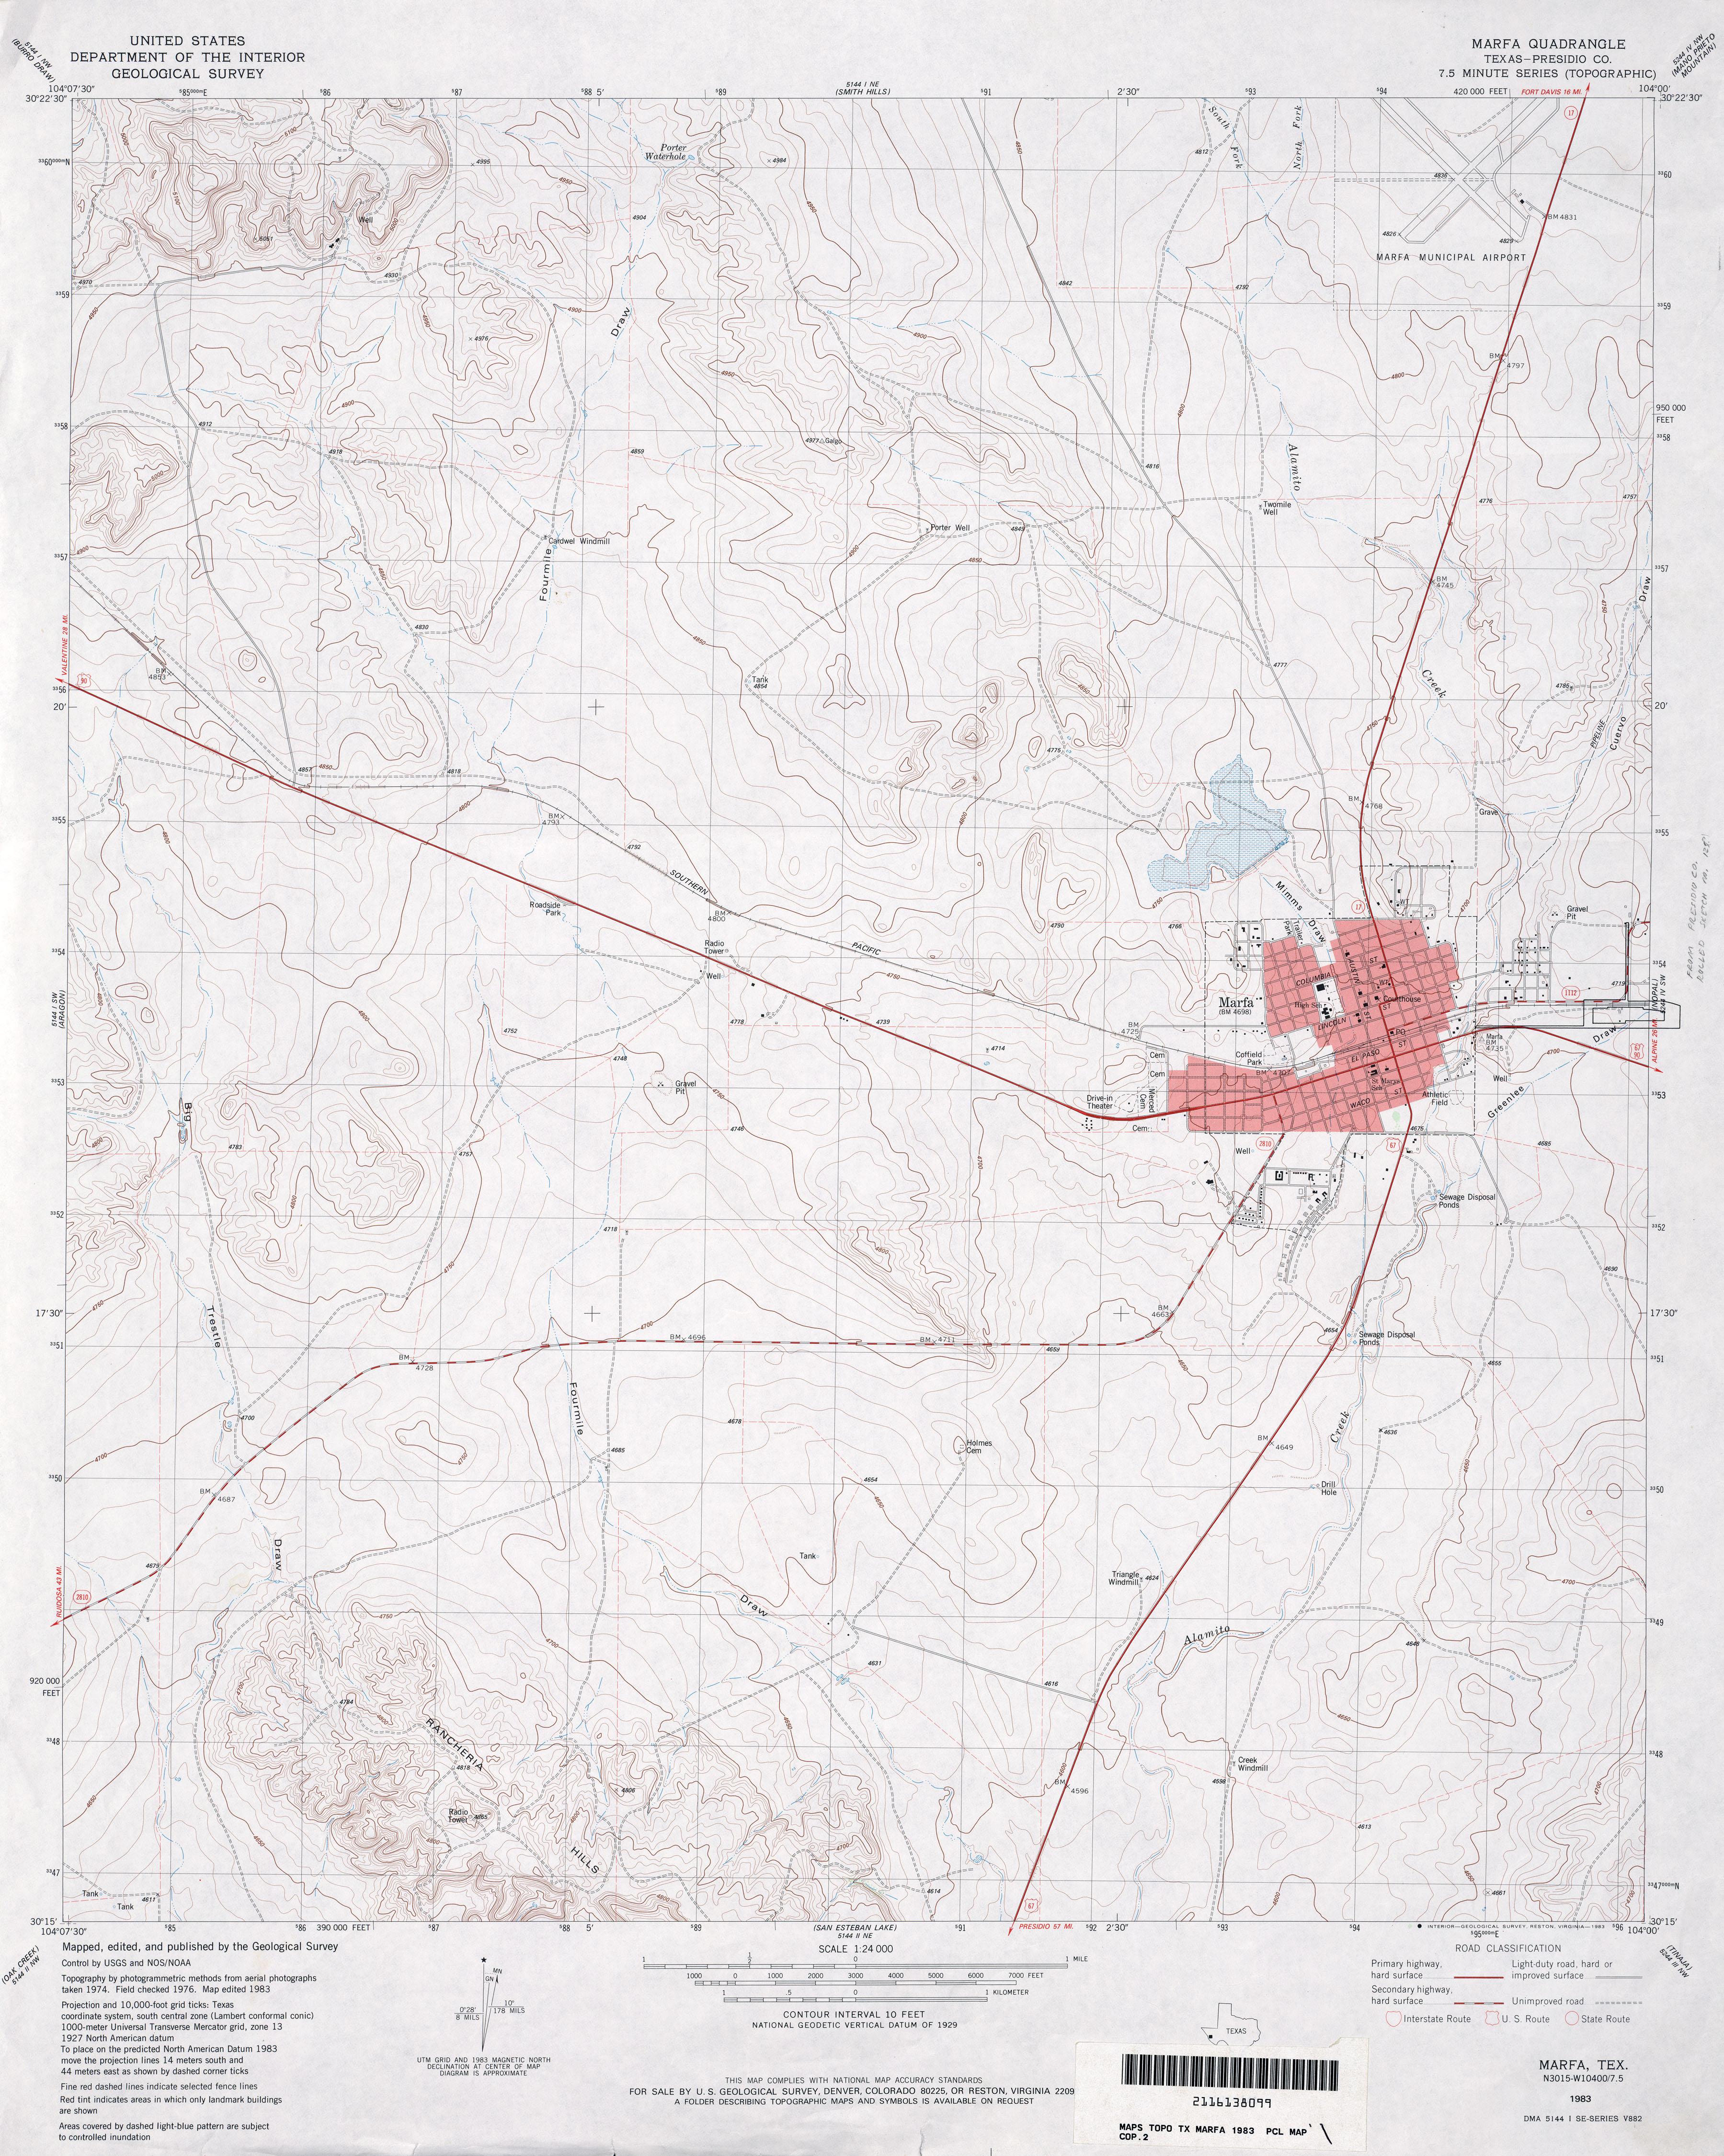 Texas Topographic Maps PerryCastañeda Map Collection UT - Map of colorado river in texas